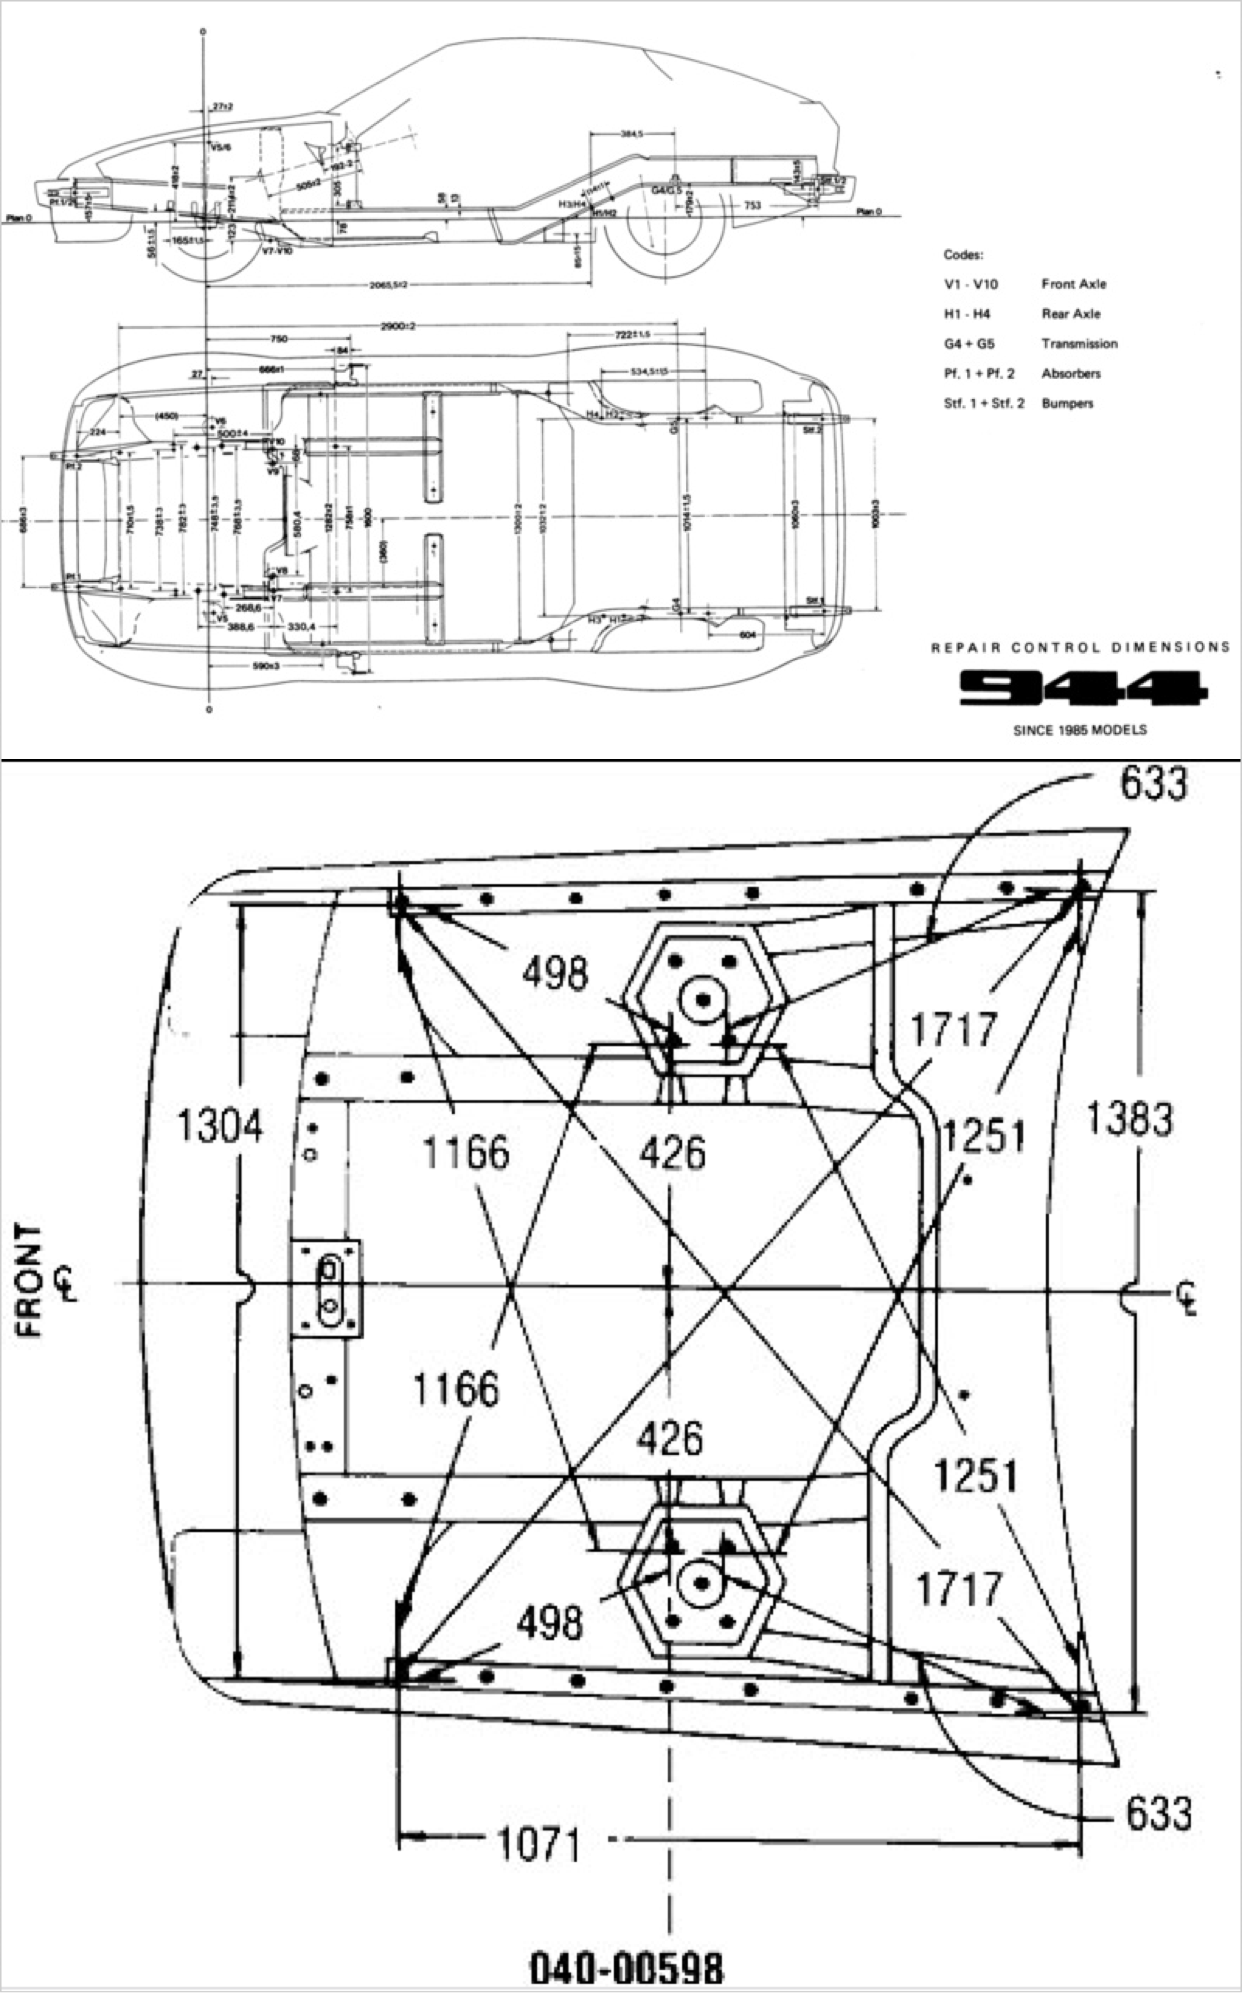 porsche 944 repair control dimensions front detail porsche porsche 911 engine diagram further porsche 924 transmission diagram [ 1242 x 1993 Pixel ]